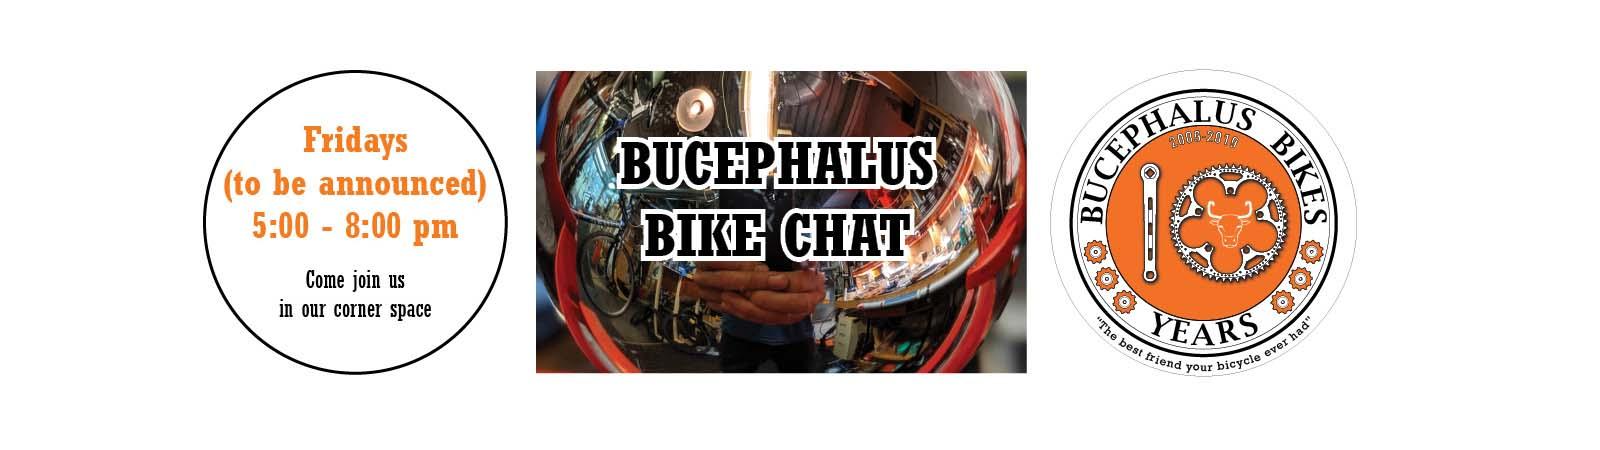 Bucephalus Bike Chat